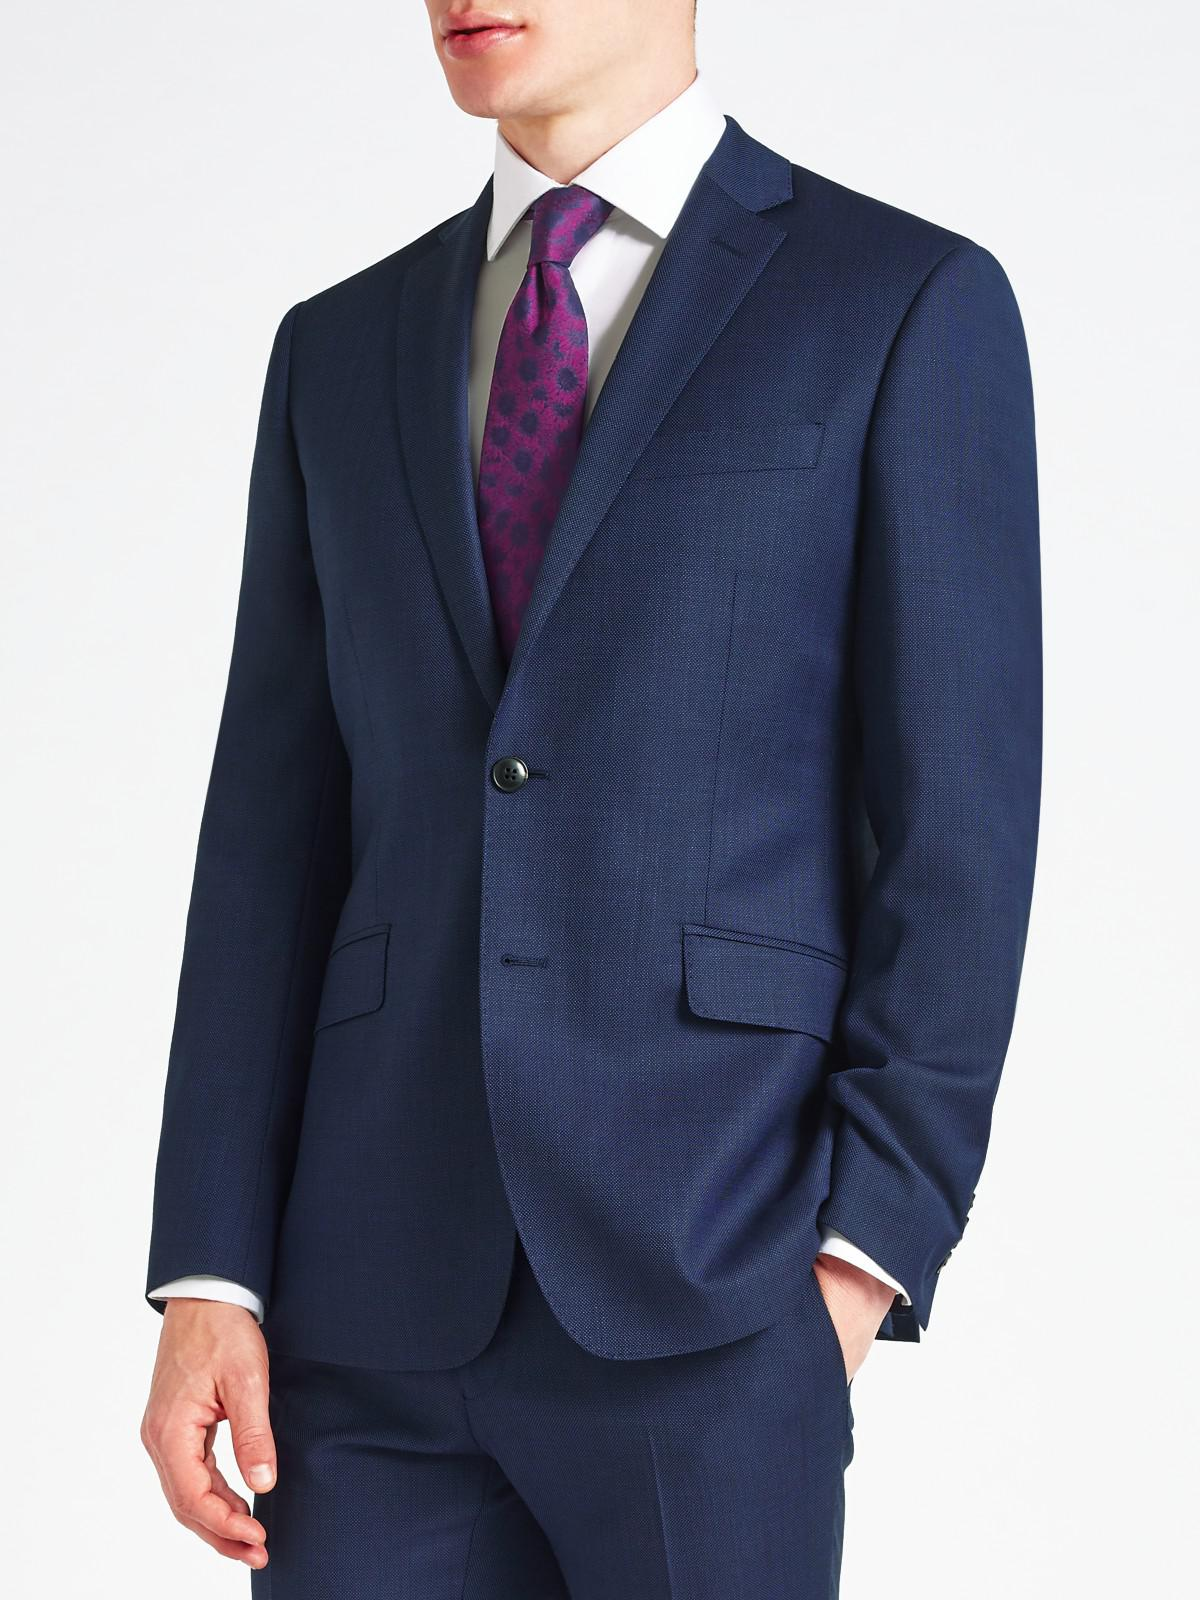 Richard James Wool Pindot Slim Suit Jacket in Electric Blue (Blue) for Men